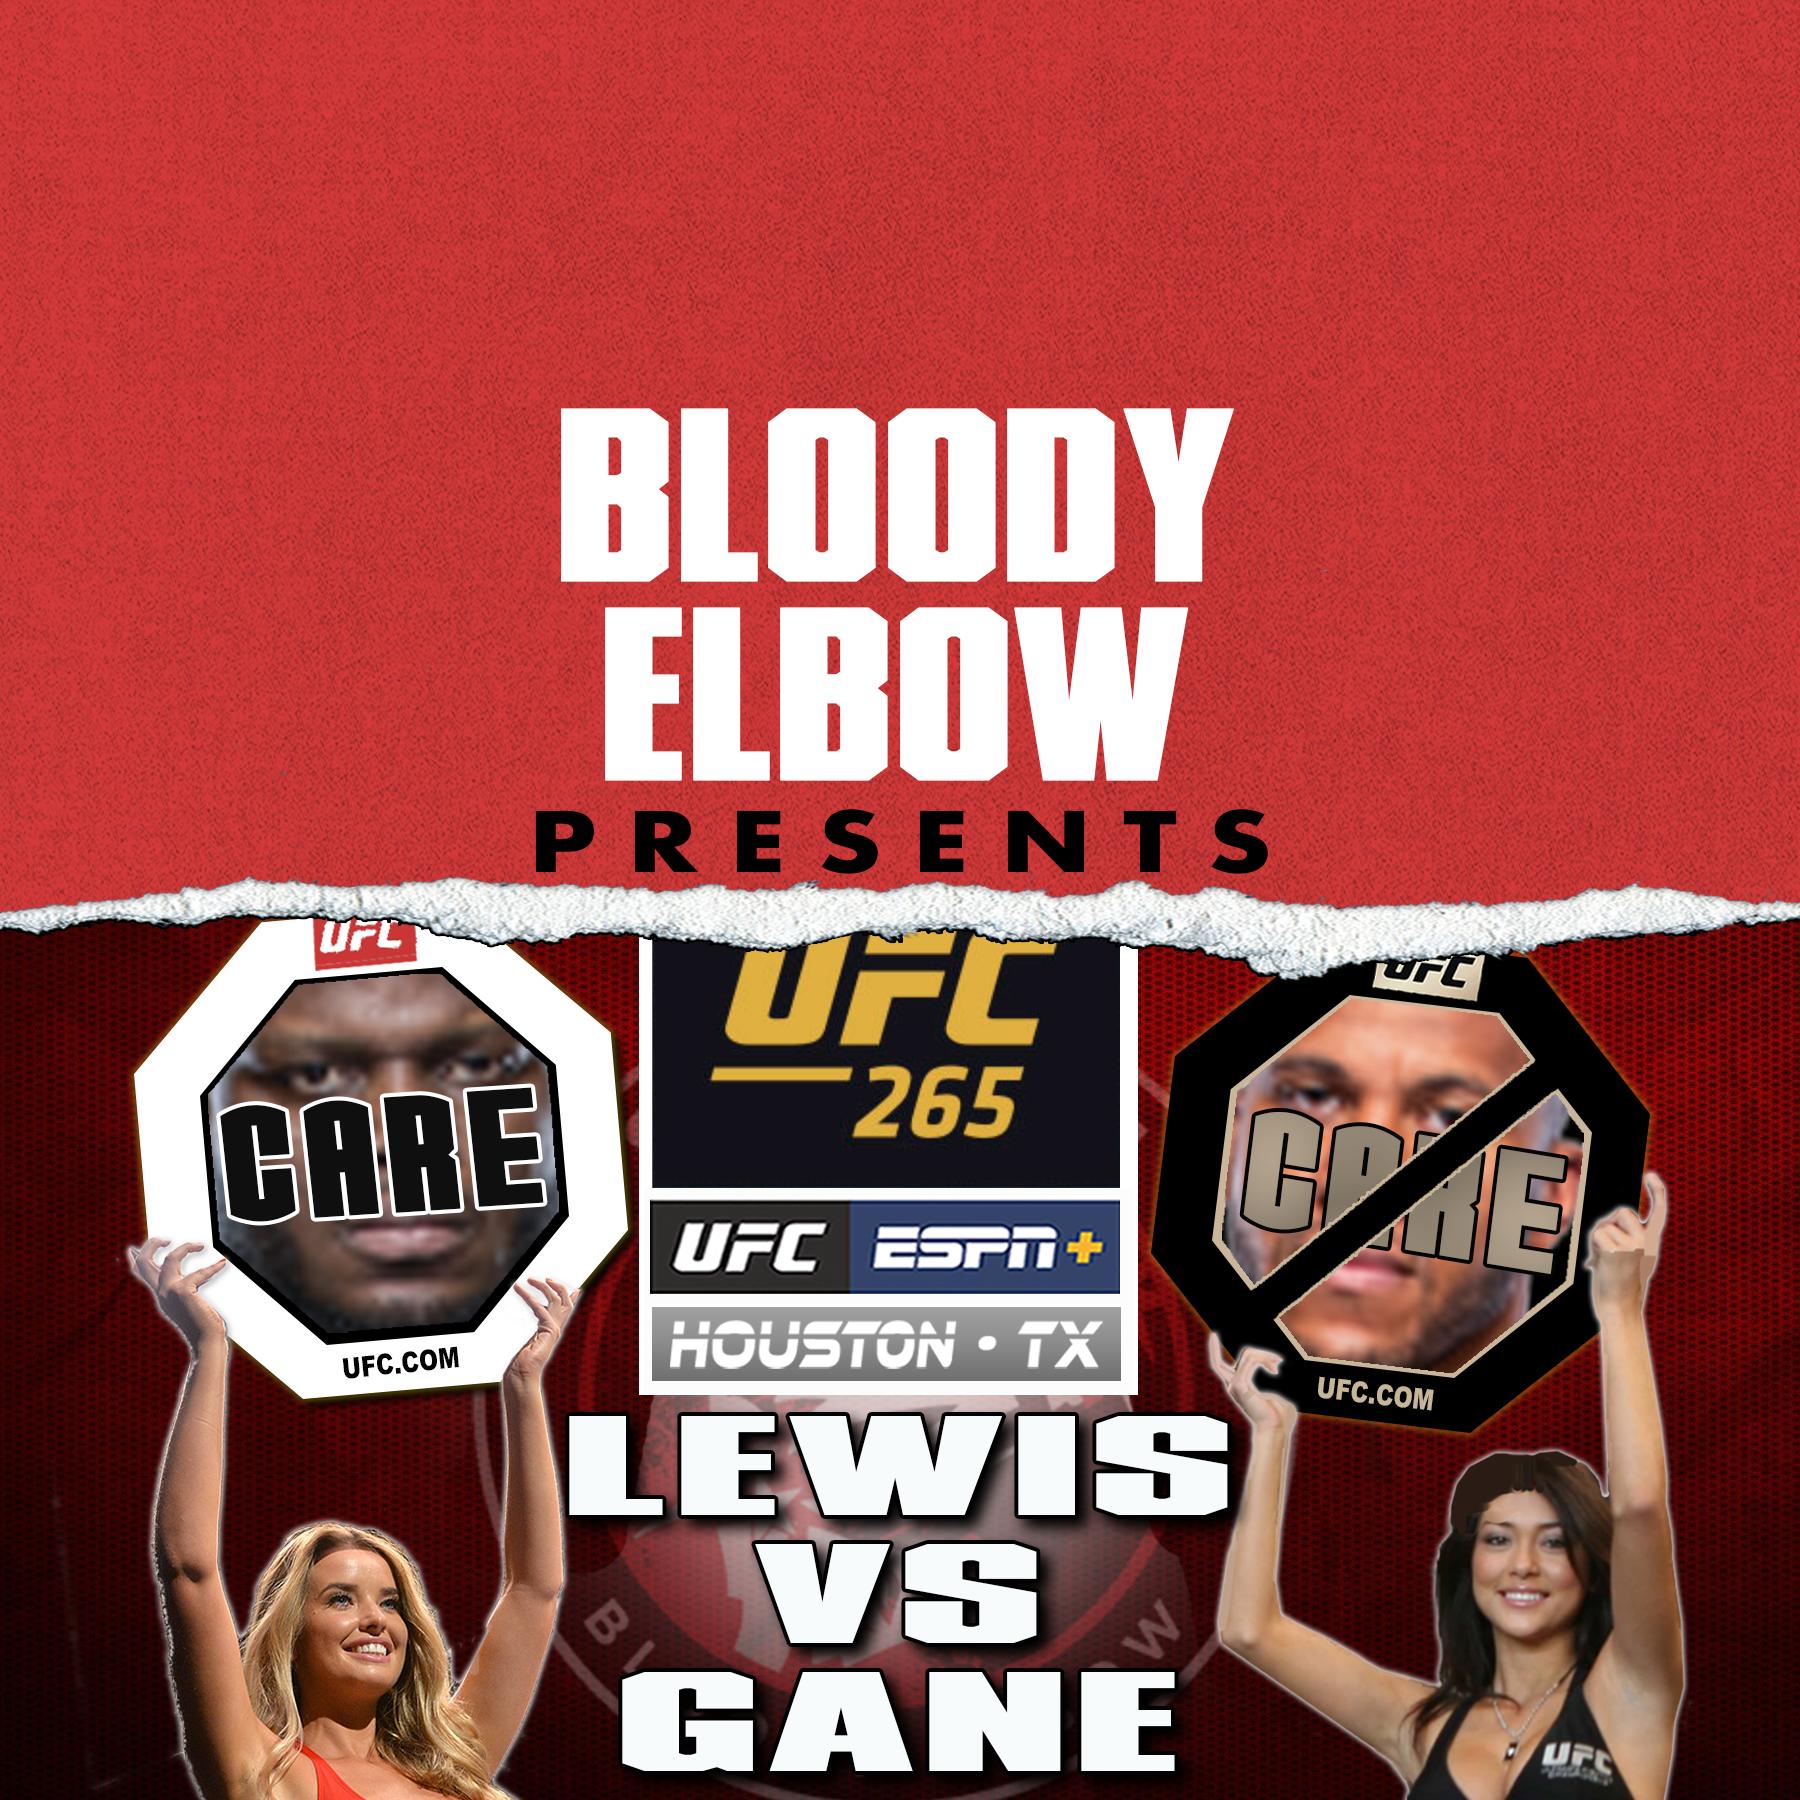 CDC, Care/Don't Care Podcast, UFC Vegas 33, UFC 265, Strickland vs Hall, Bellator 263, Lewis vs Gane, Eugene S Robinson, John Nash, Stephie Haynes, UFC Podcast, UFC Picks & Predictions, UFC Results & Reactions,